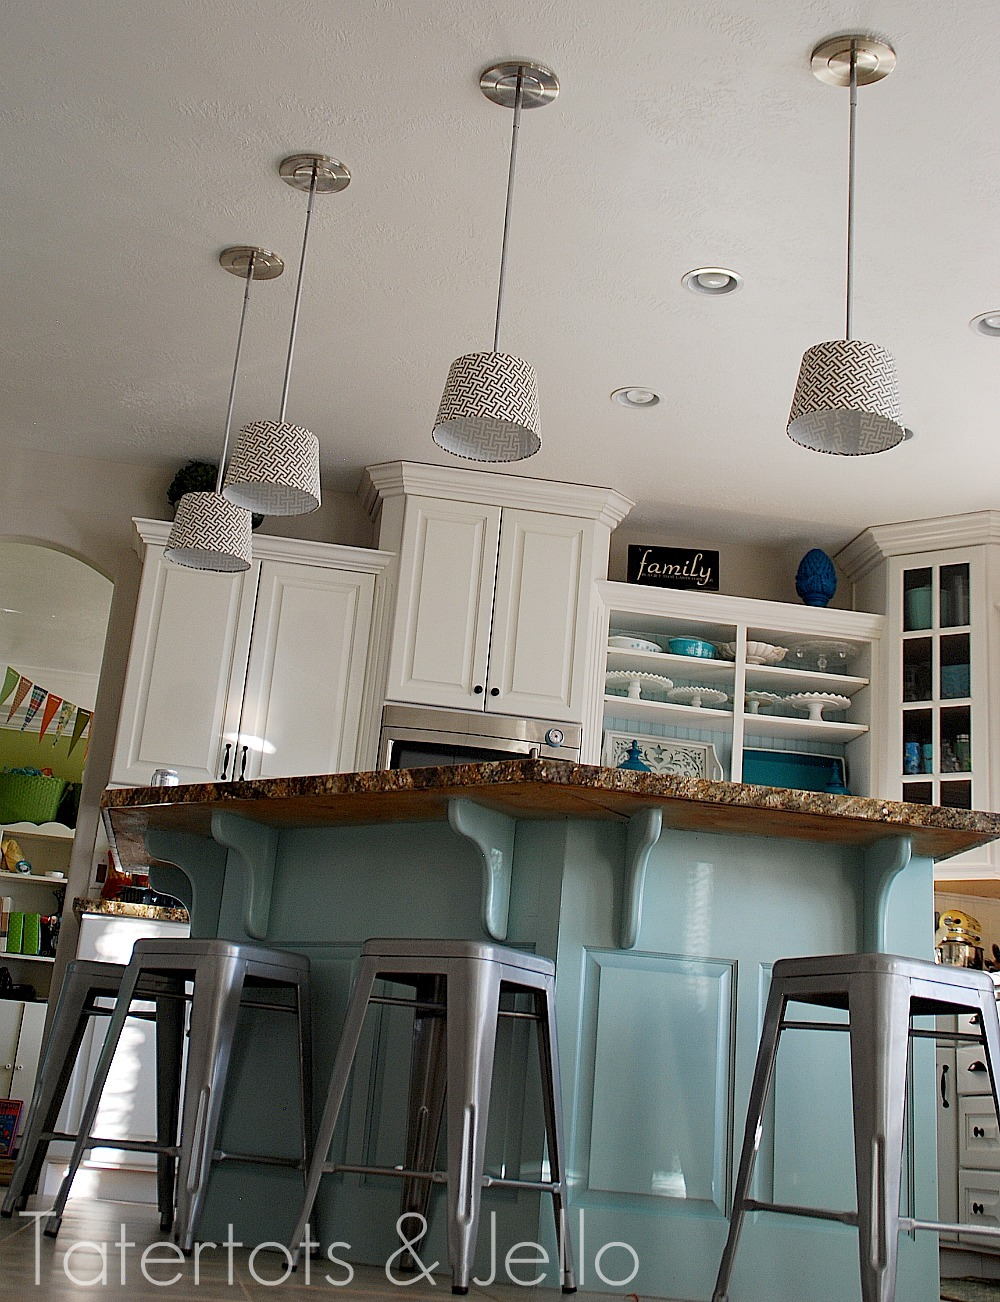 Make diy pendant lights kitchen remodel project tatertots and jello - Diy kitchen lighting ...